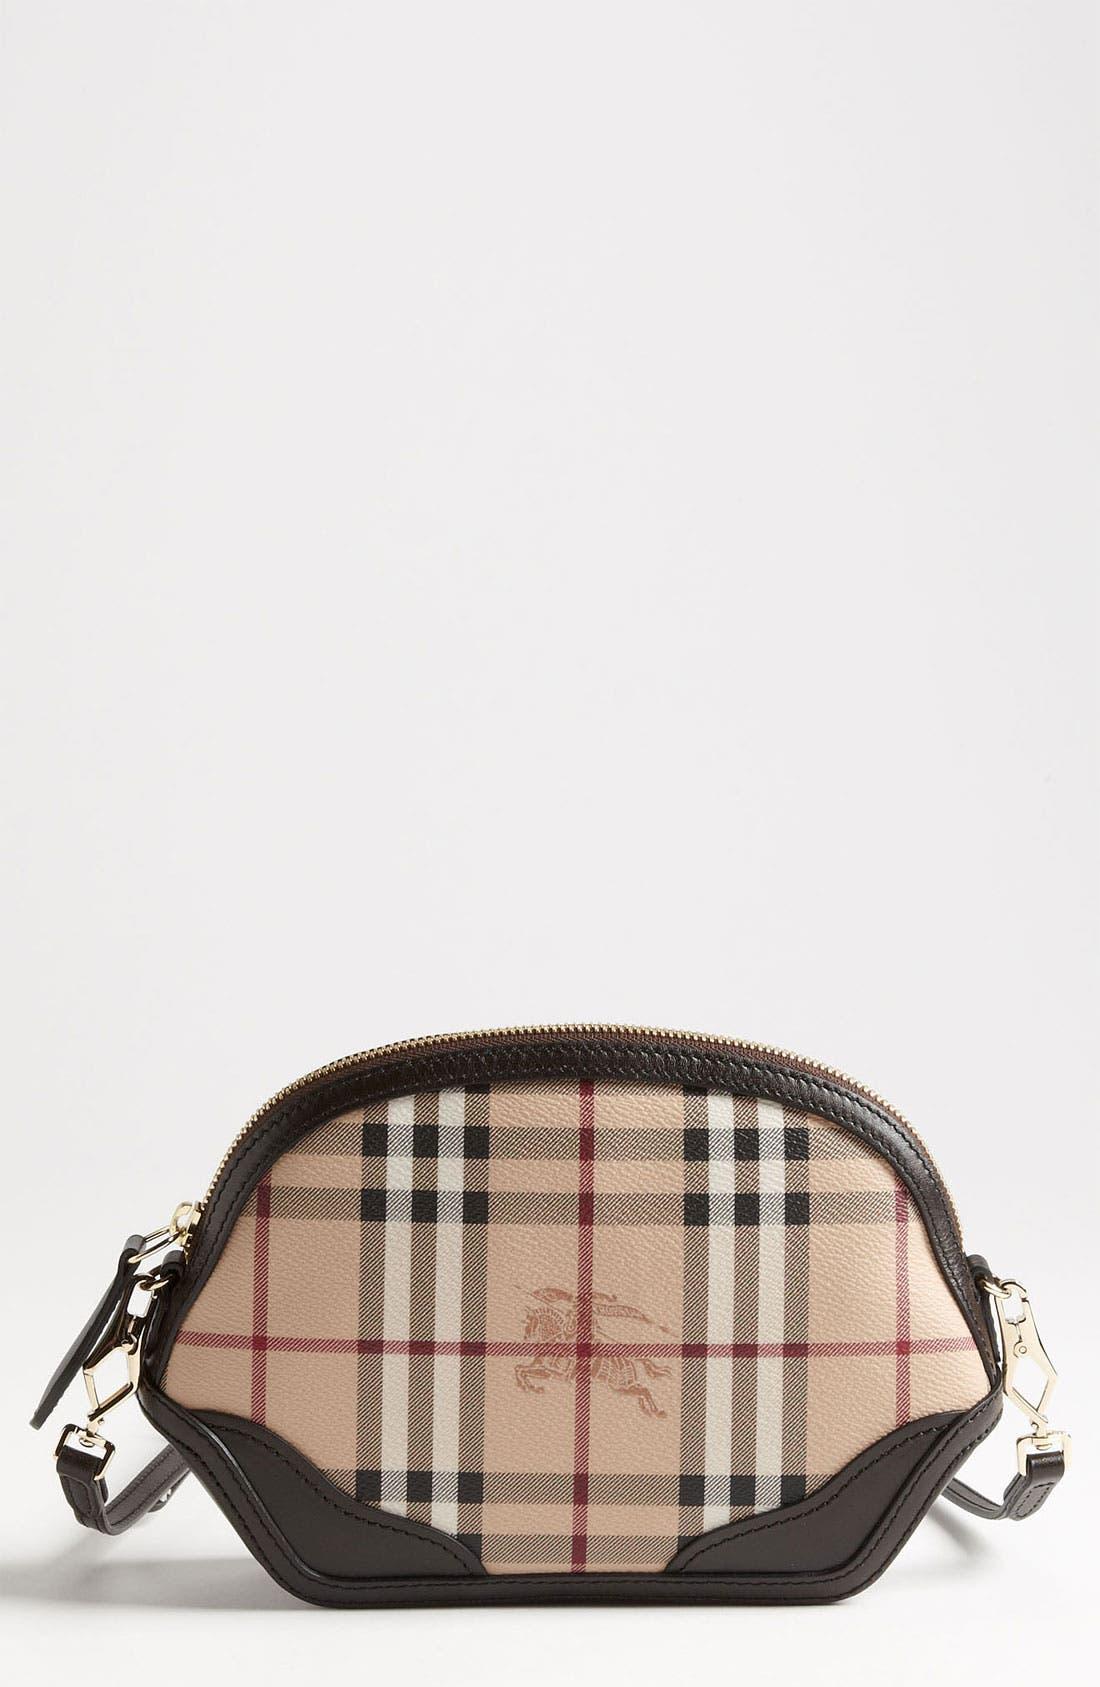 Alternate Image 1 Selected - Burberry 'Haymarket Check - Mini' Crossbody Bag